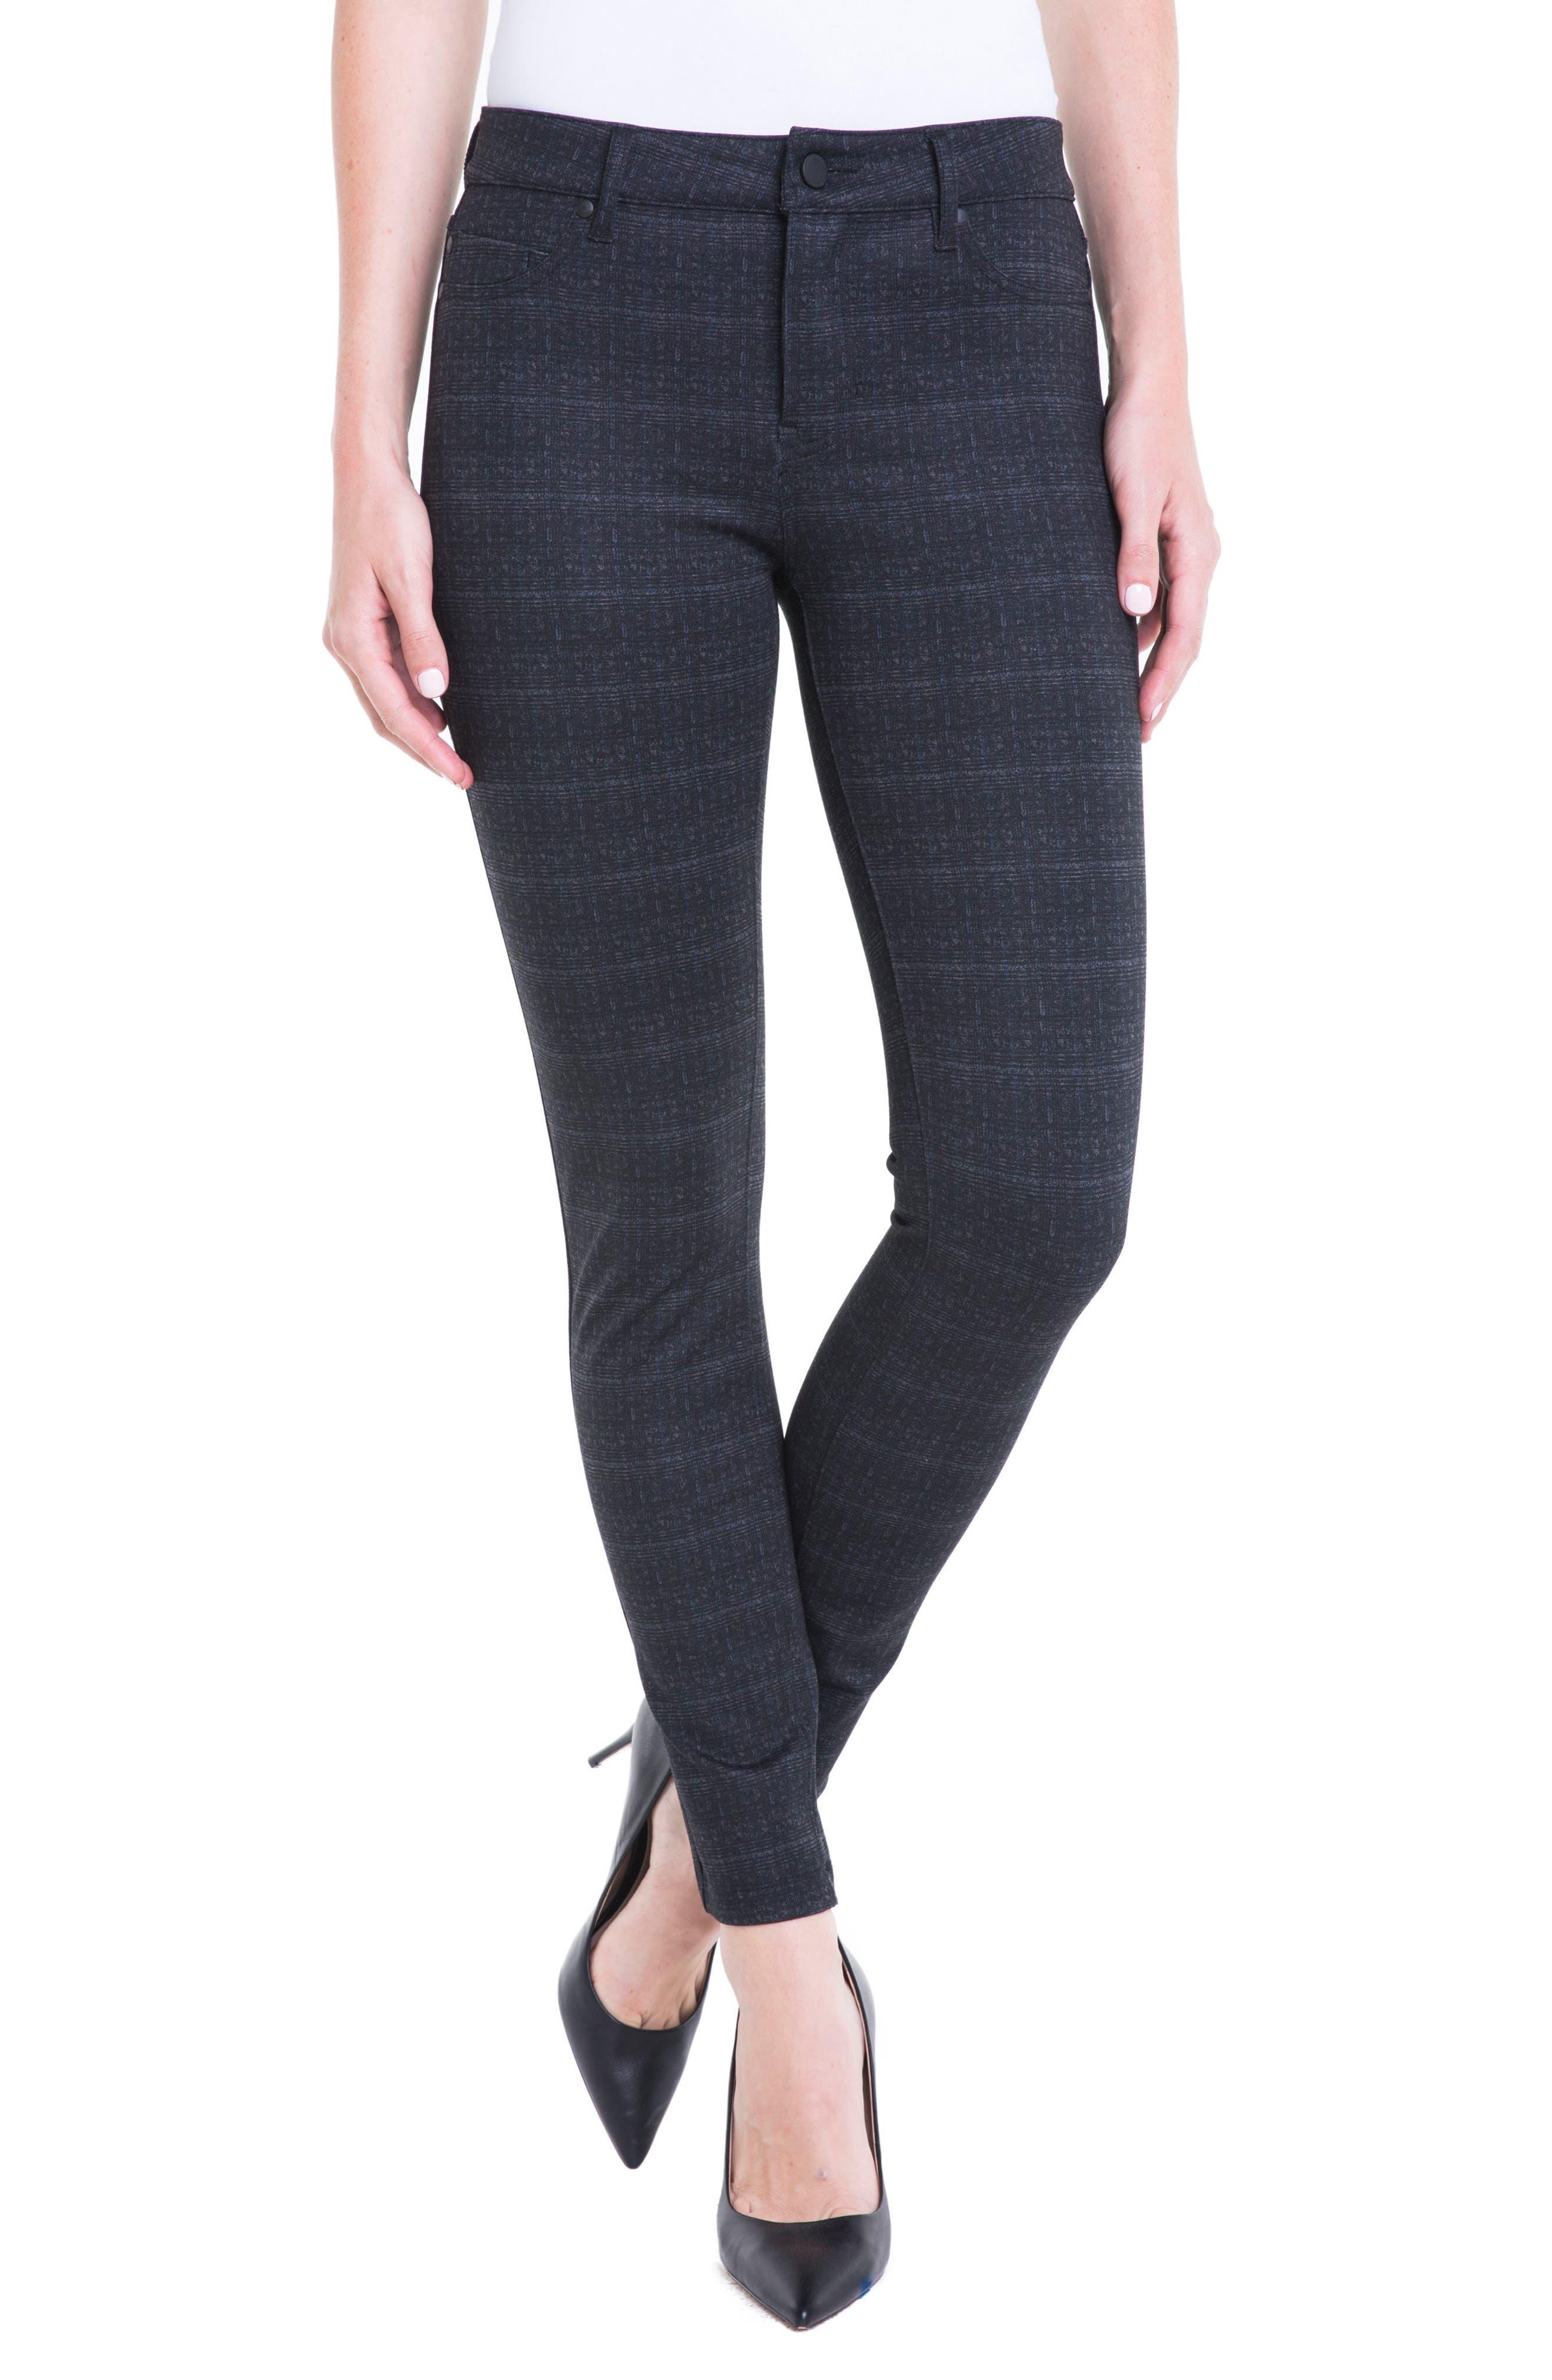 Plaid Super Skinny Ponte Knit Pants,                             Main thumbnail 1, color,                             022